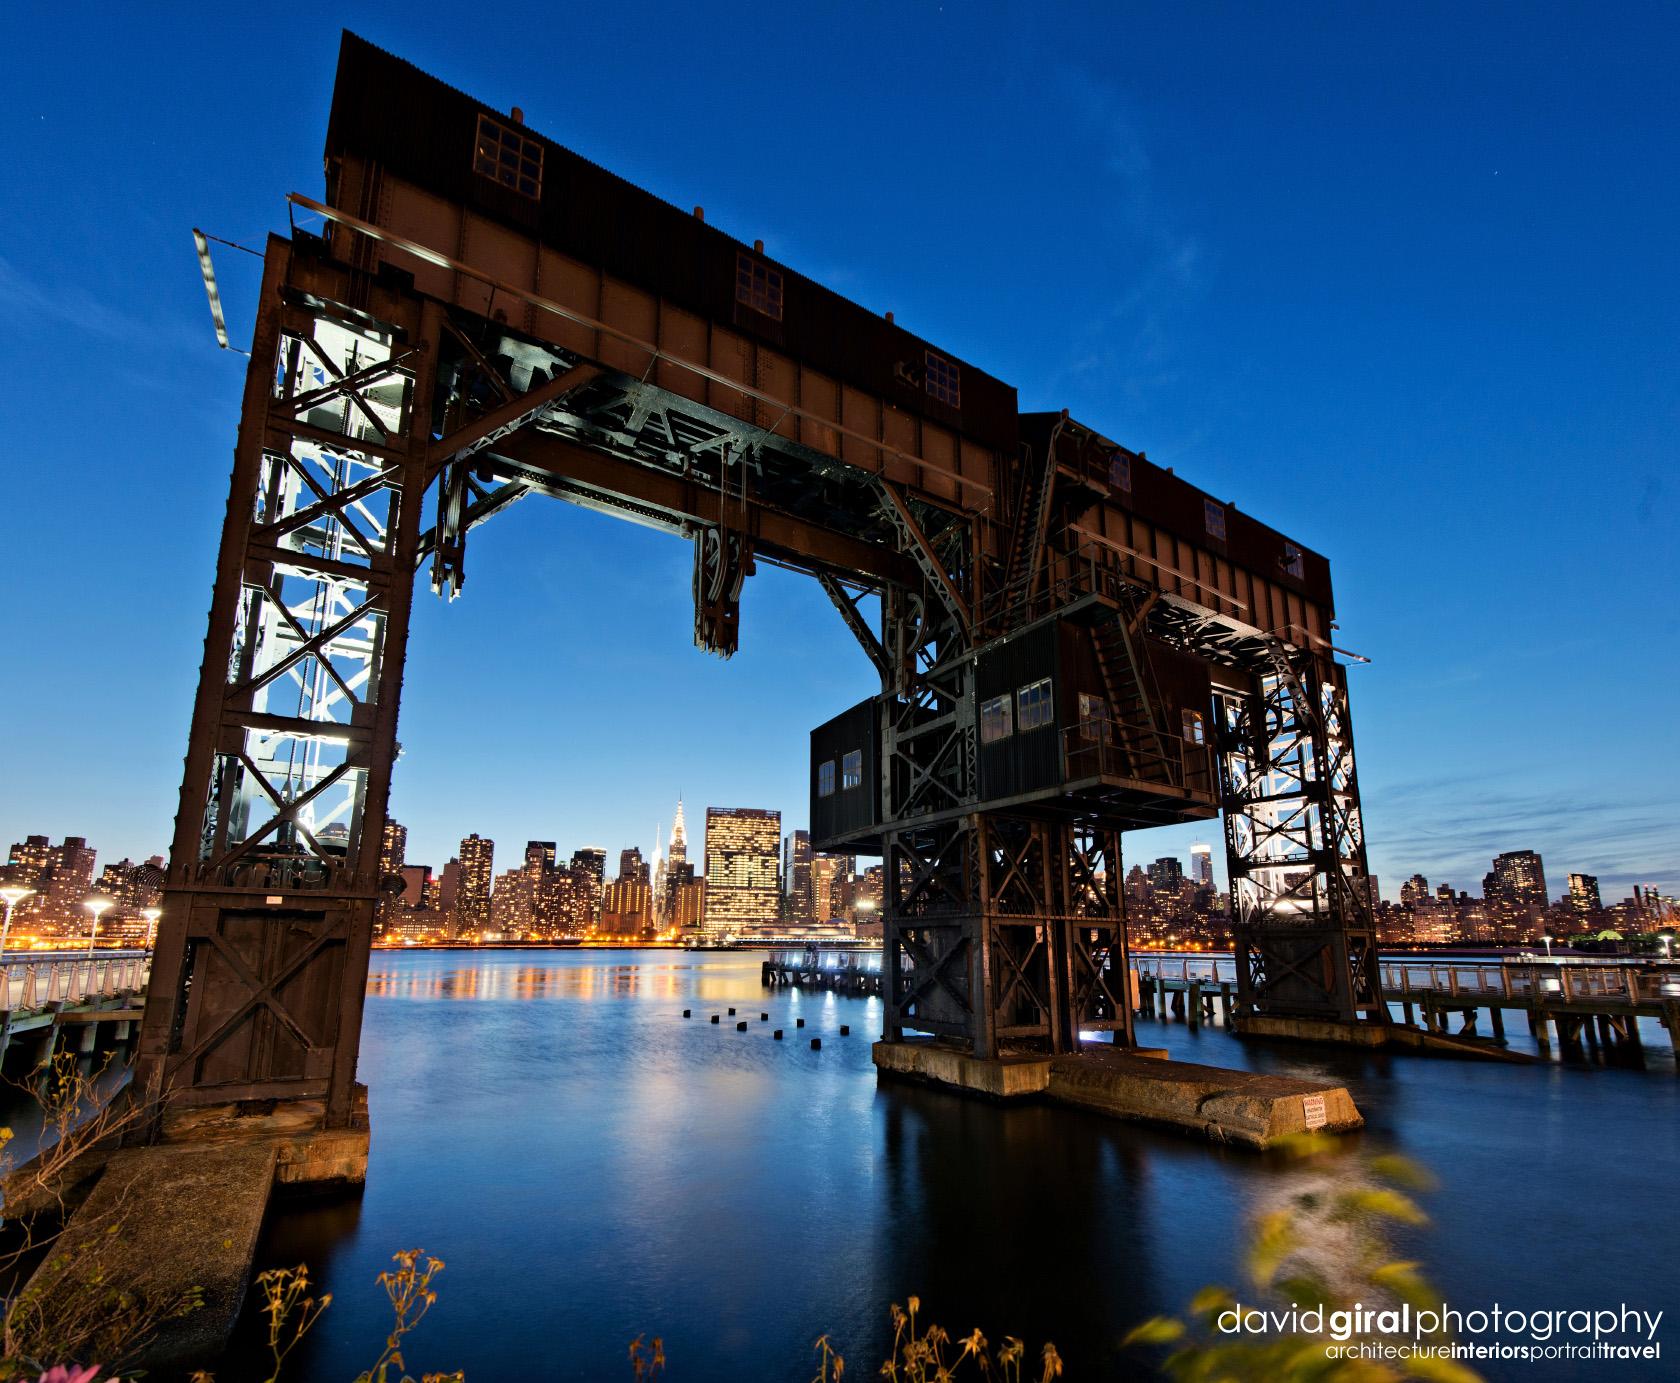 04-dgiral-gantry-park-long-island-queens-transfer-bridges-nyc-skyline-night